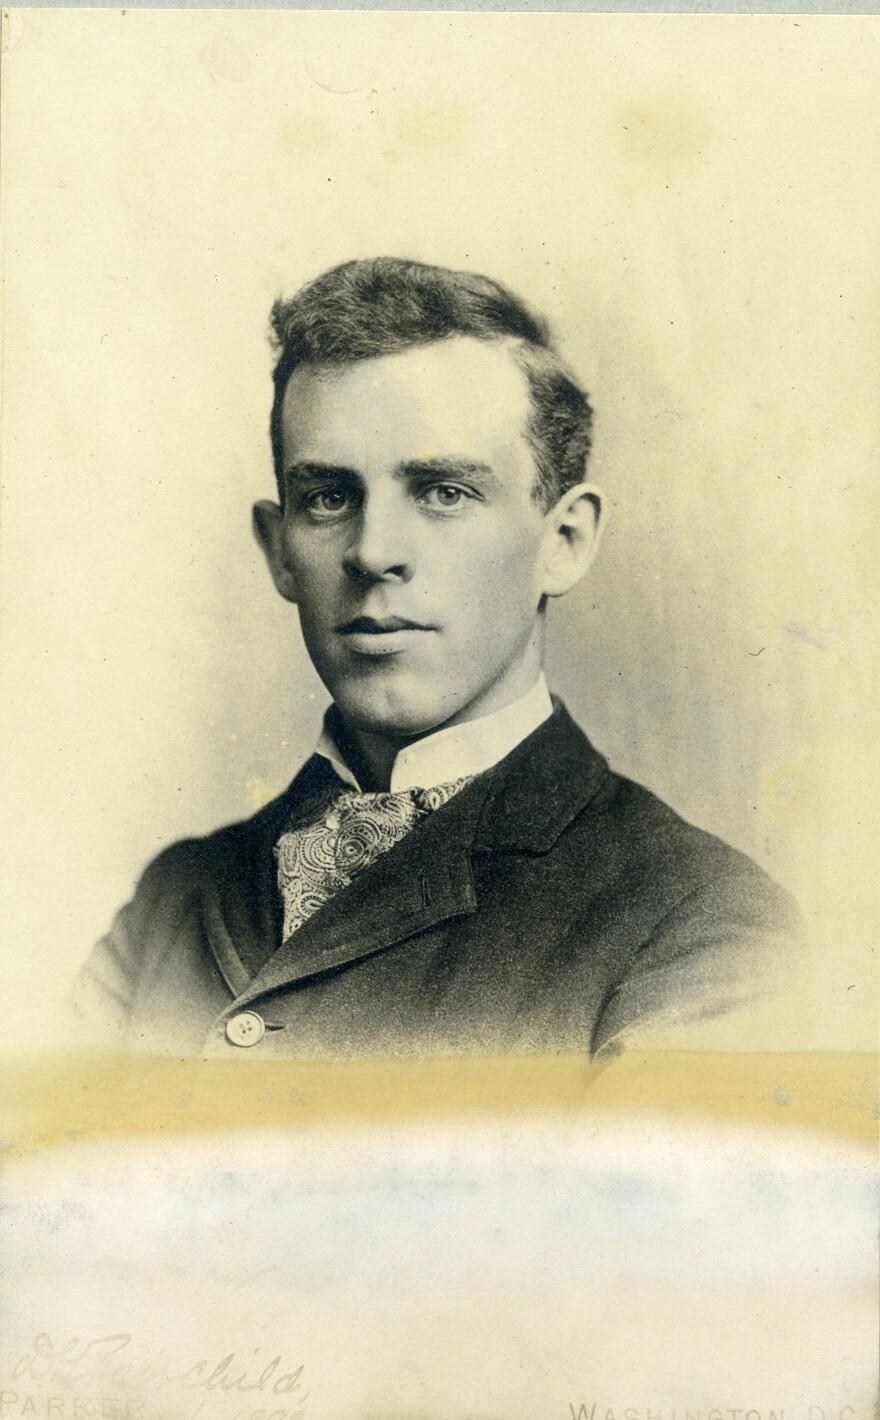 A portrait of David Fairchild.